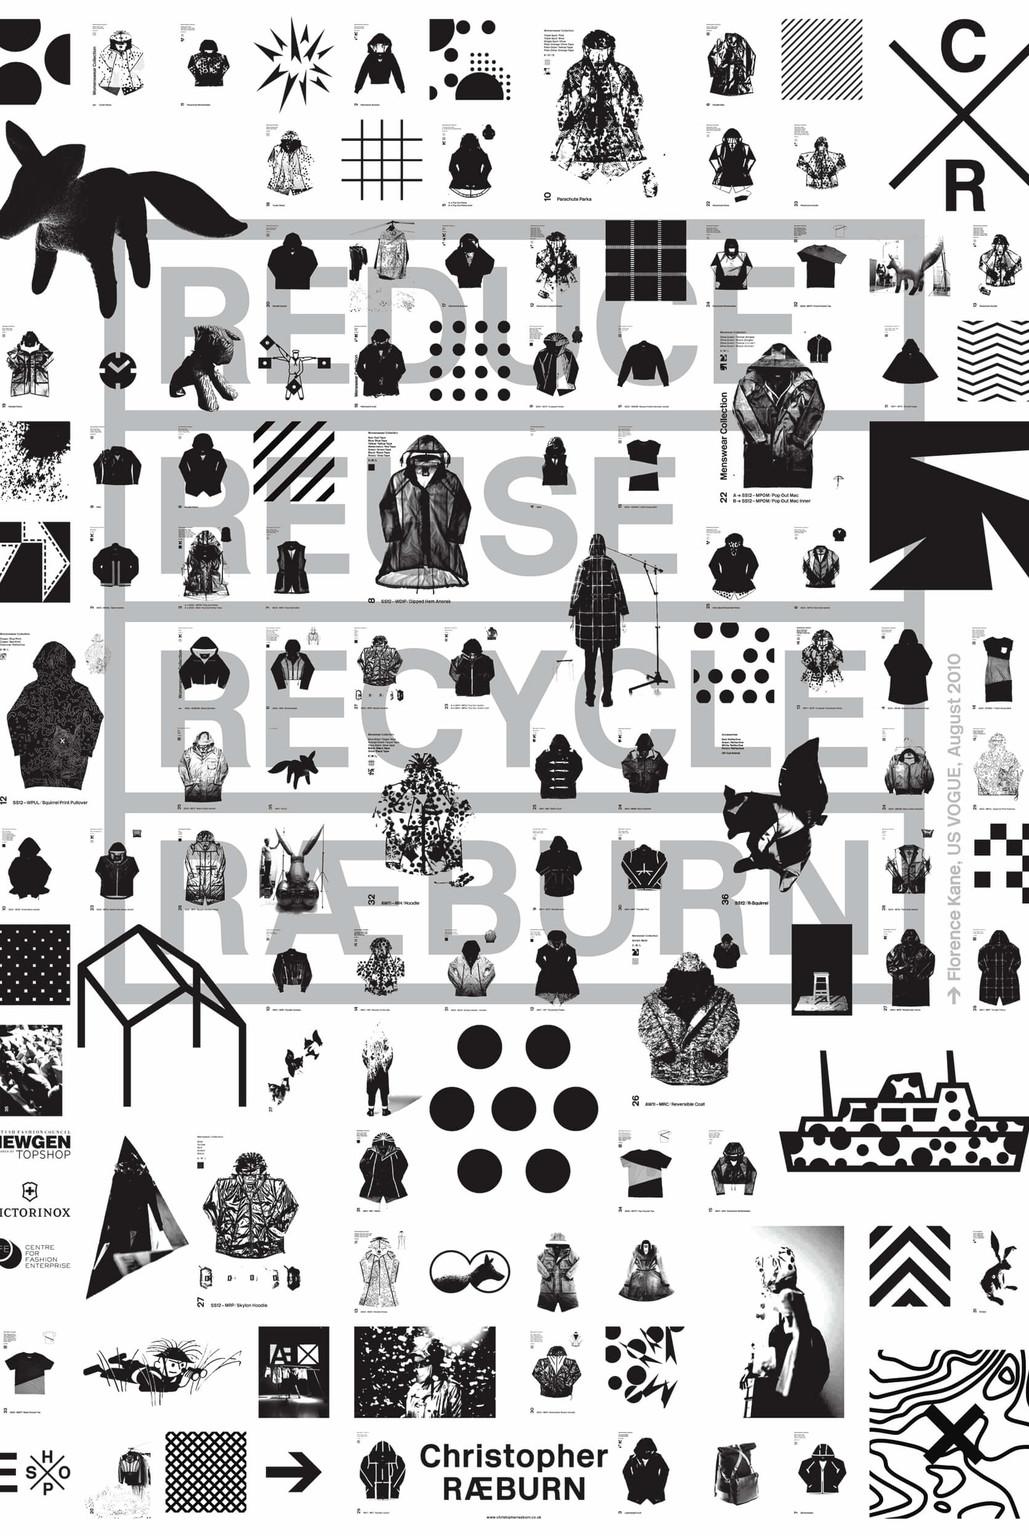 Christopher Raeburn Manifesto Poster - © © Régis Tosetti and Simon Palmieri, Swiss Design Awards Blog